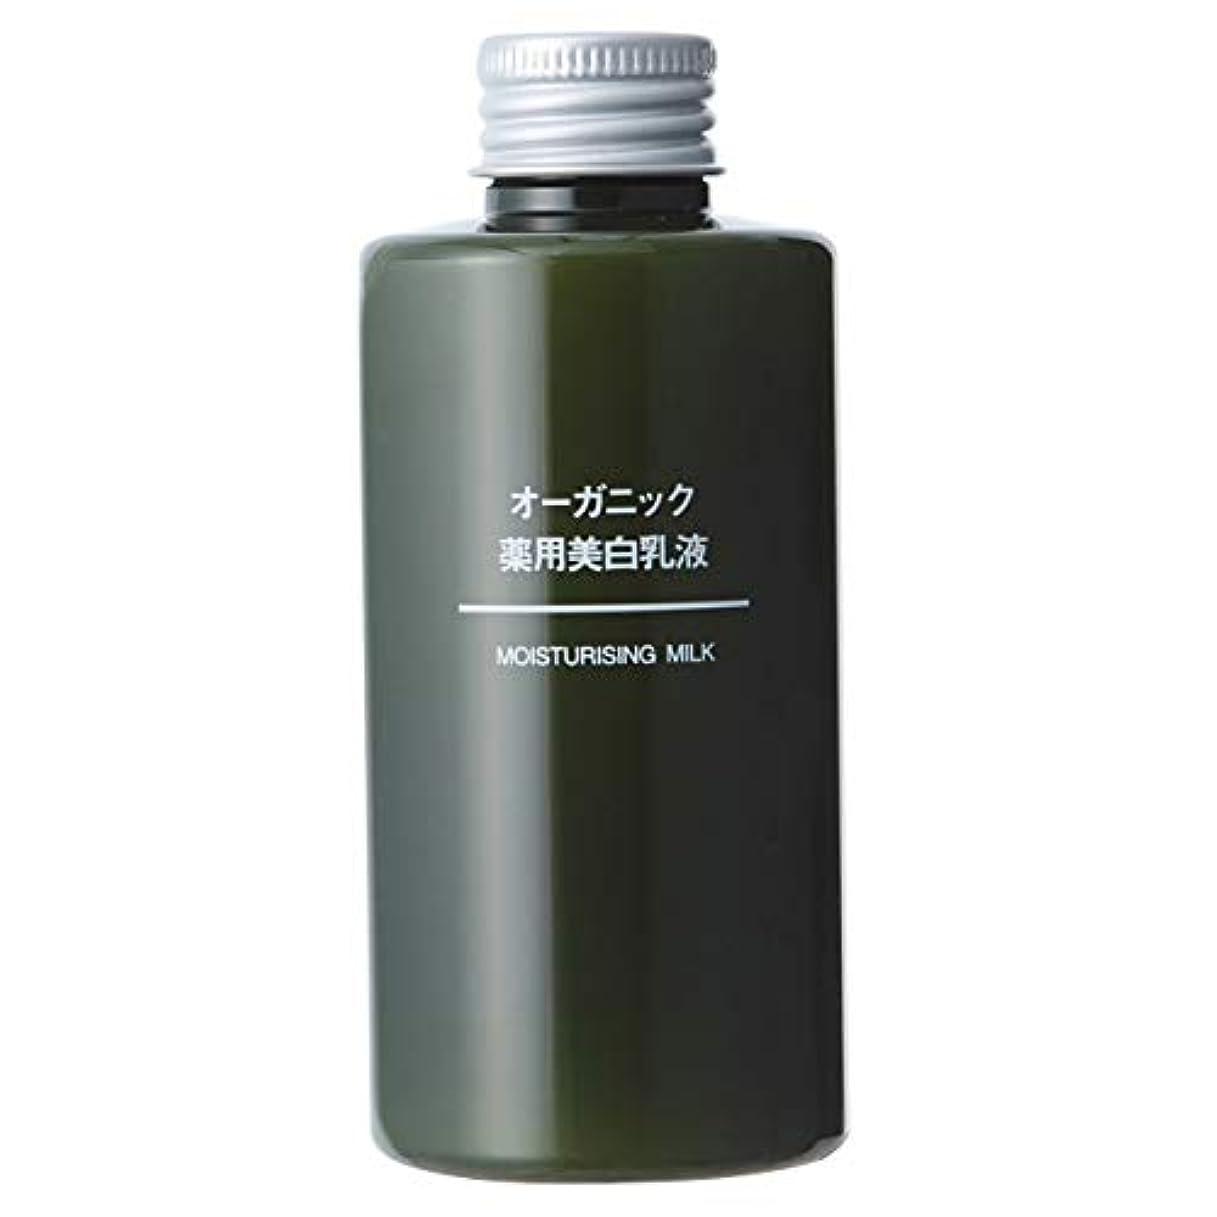 送料荷物民主主義無印良品 オーガニック薬用美白乳液 (新)150ml